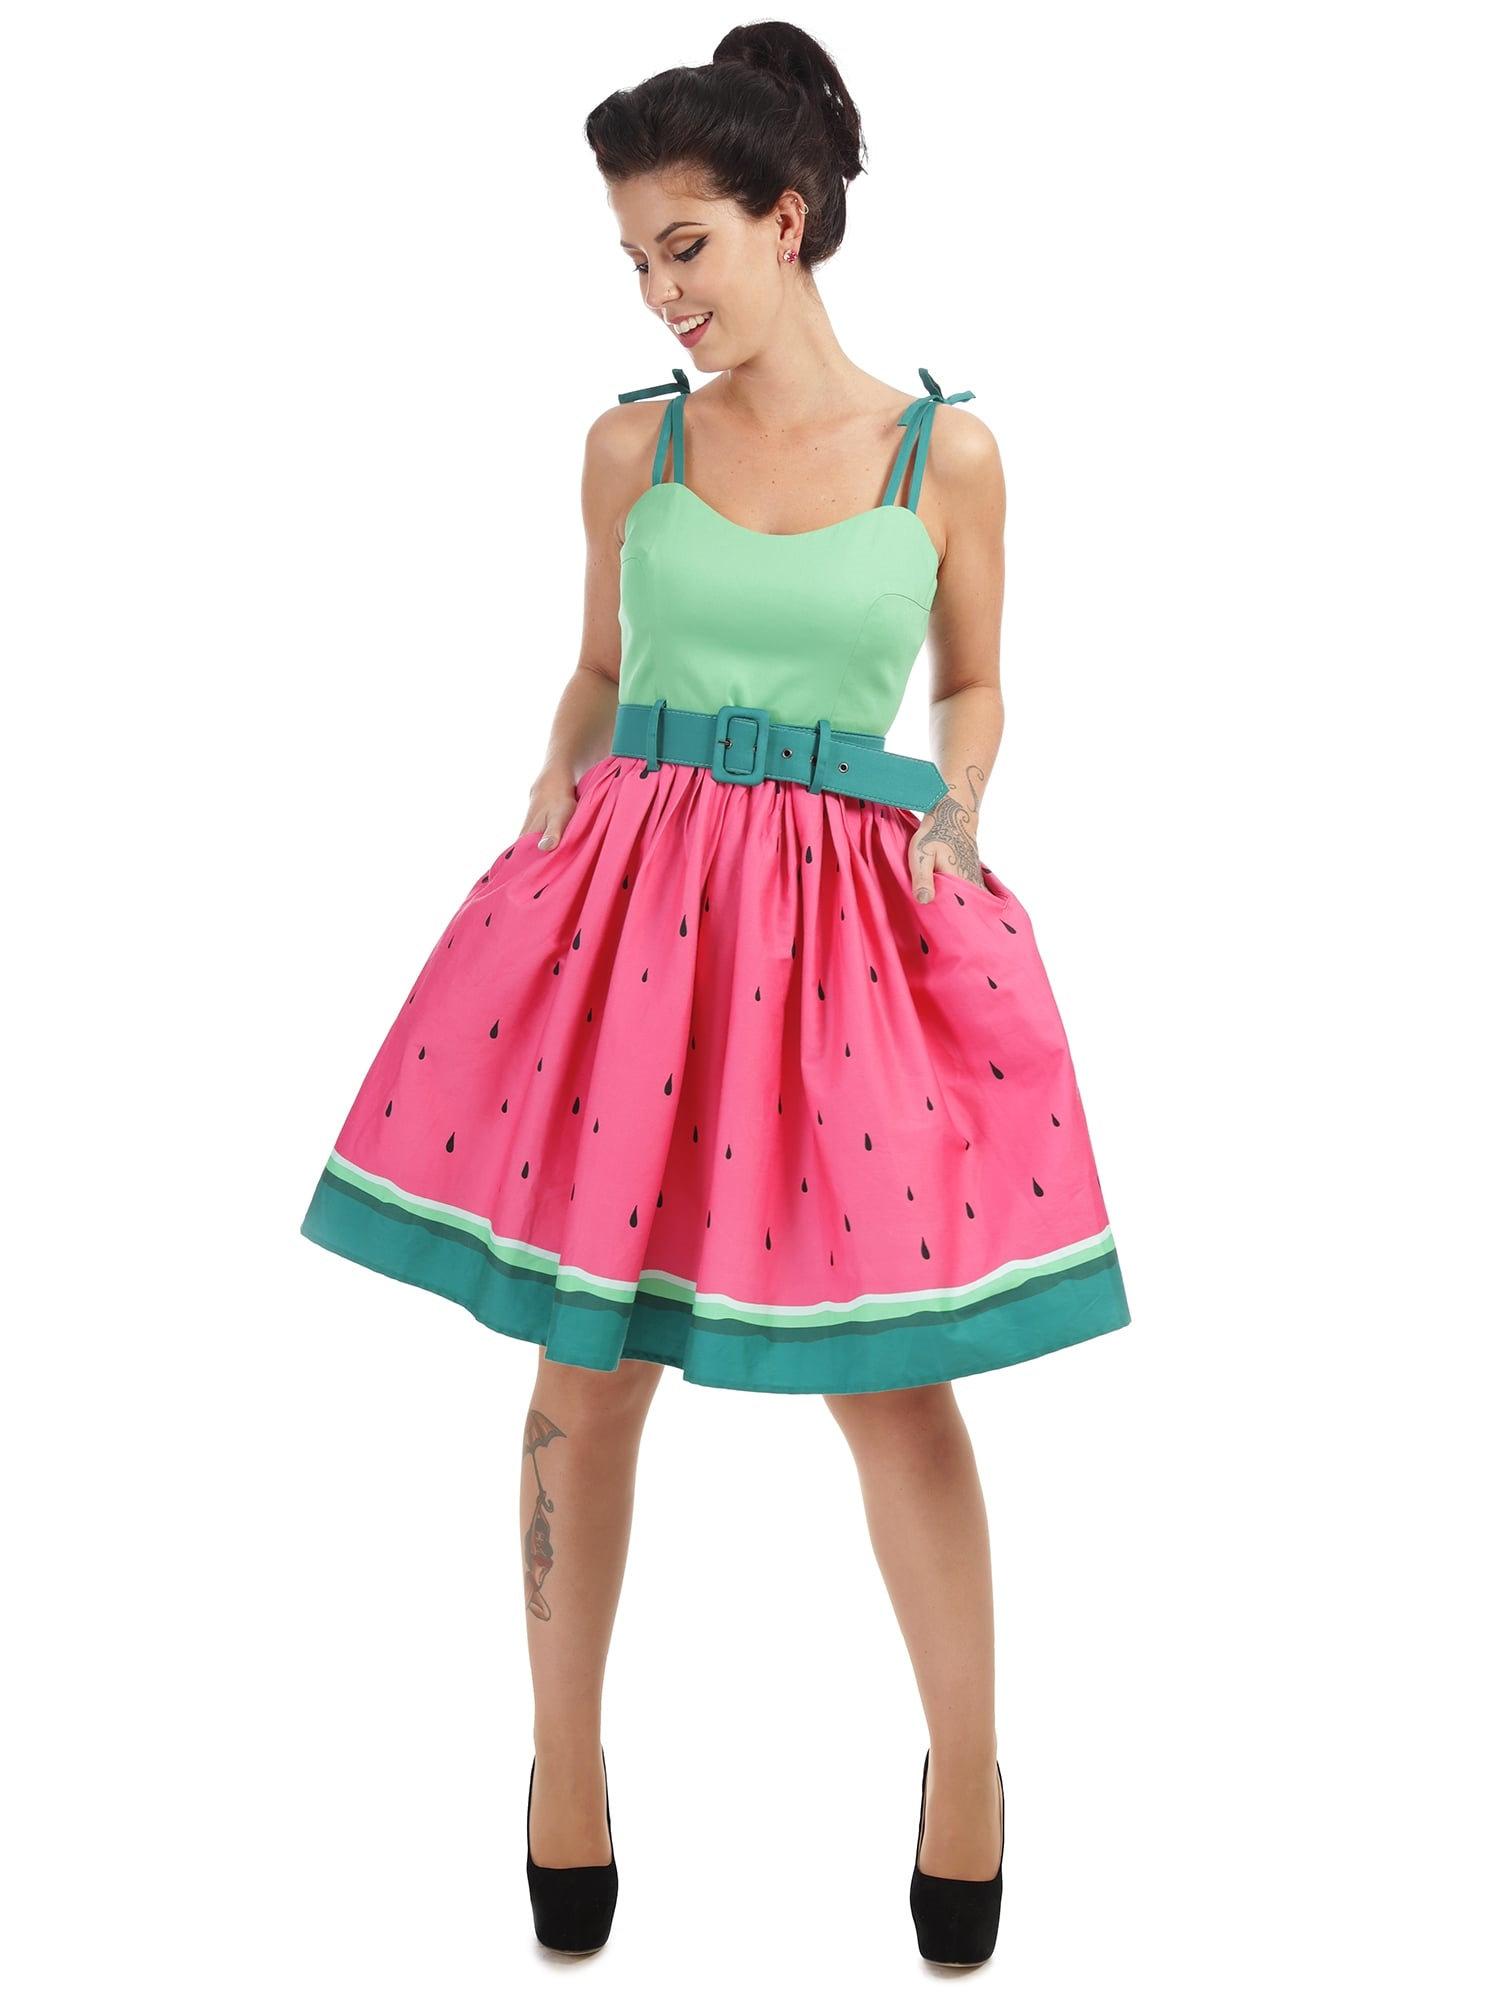 COS Shop - Jade Watermelon Swing Dress, Kleid Collectif, 18er, 18